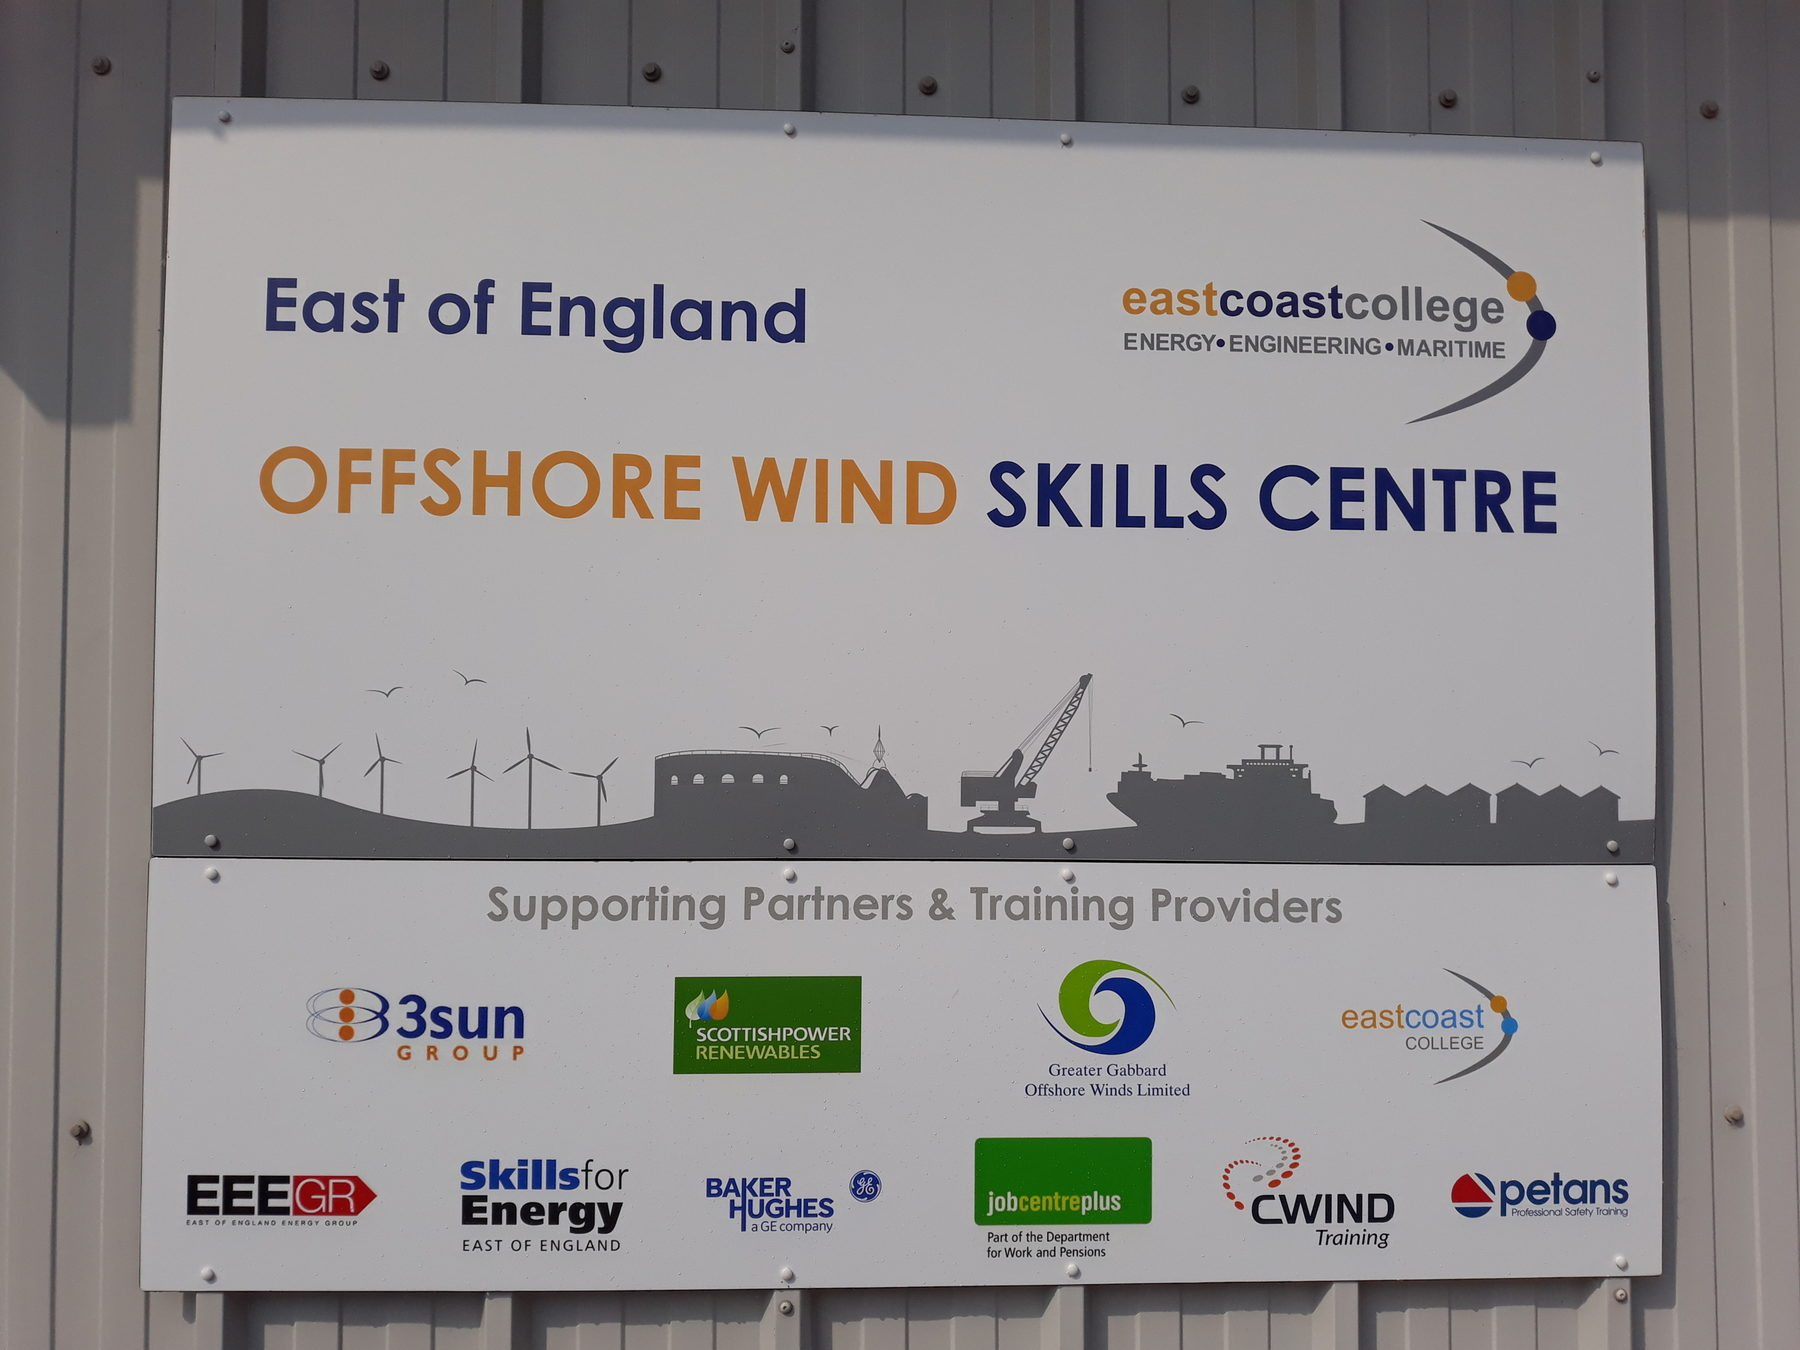 Organisation Image (Offshore Wind Skills Centre: Offshore Wind Skills Centre Board)